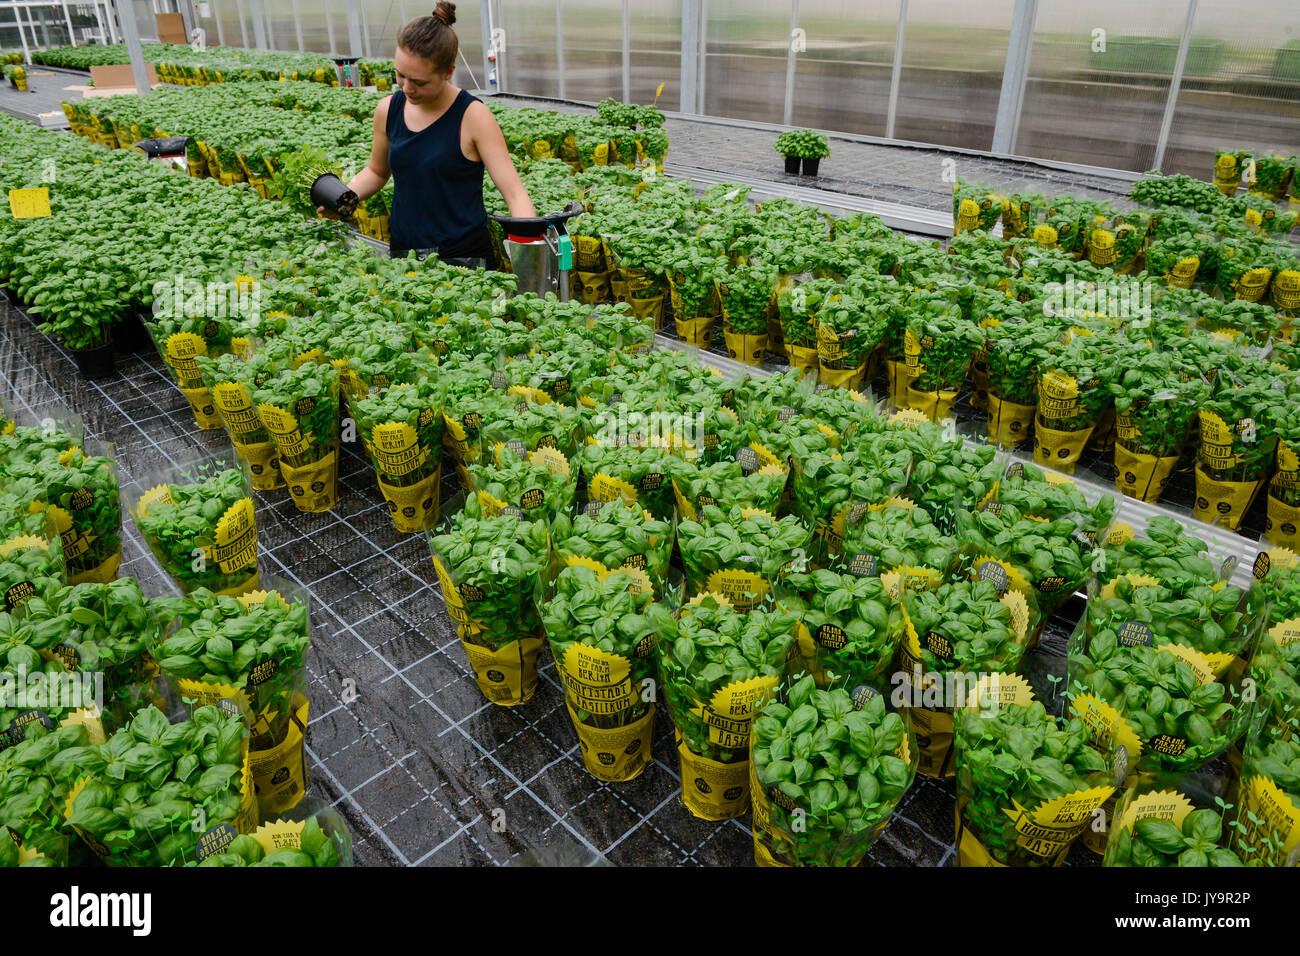 urban gardening in berlin germany stock photos urban gardening in berlin germany stock images. Black Bedroom Furniture Sets. Home Design Ideas